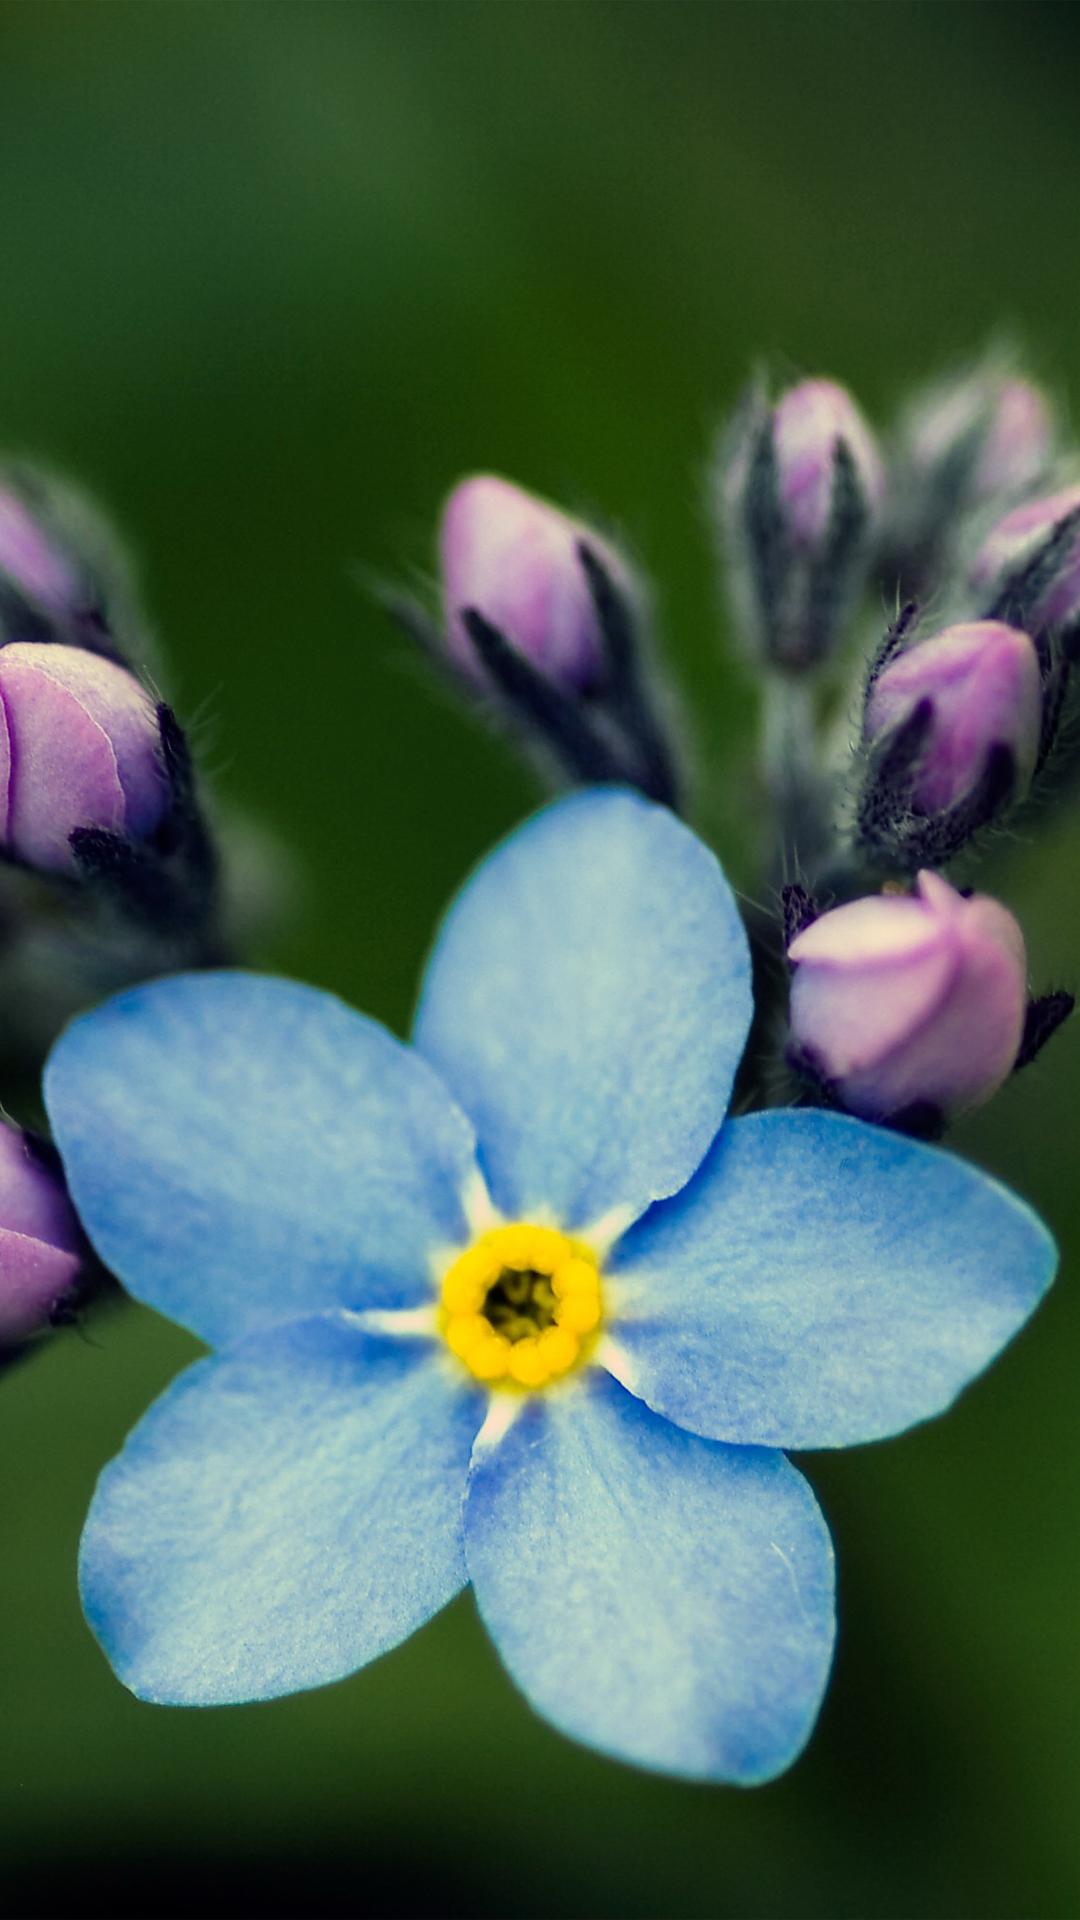 Blue flower htc wallpaper